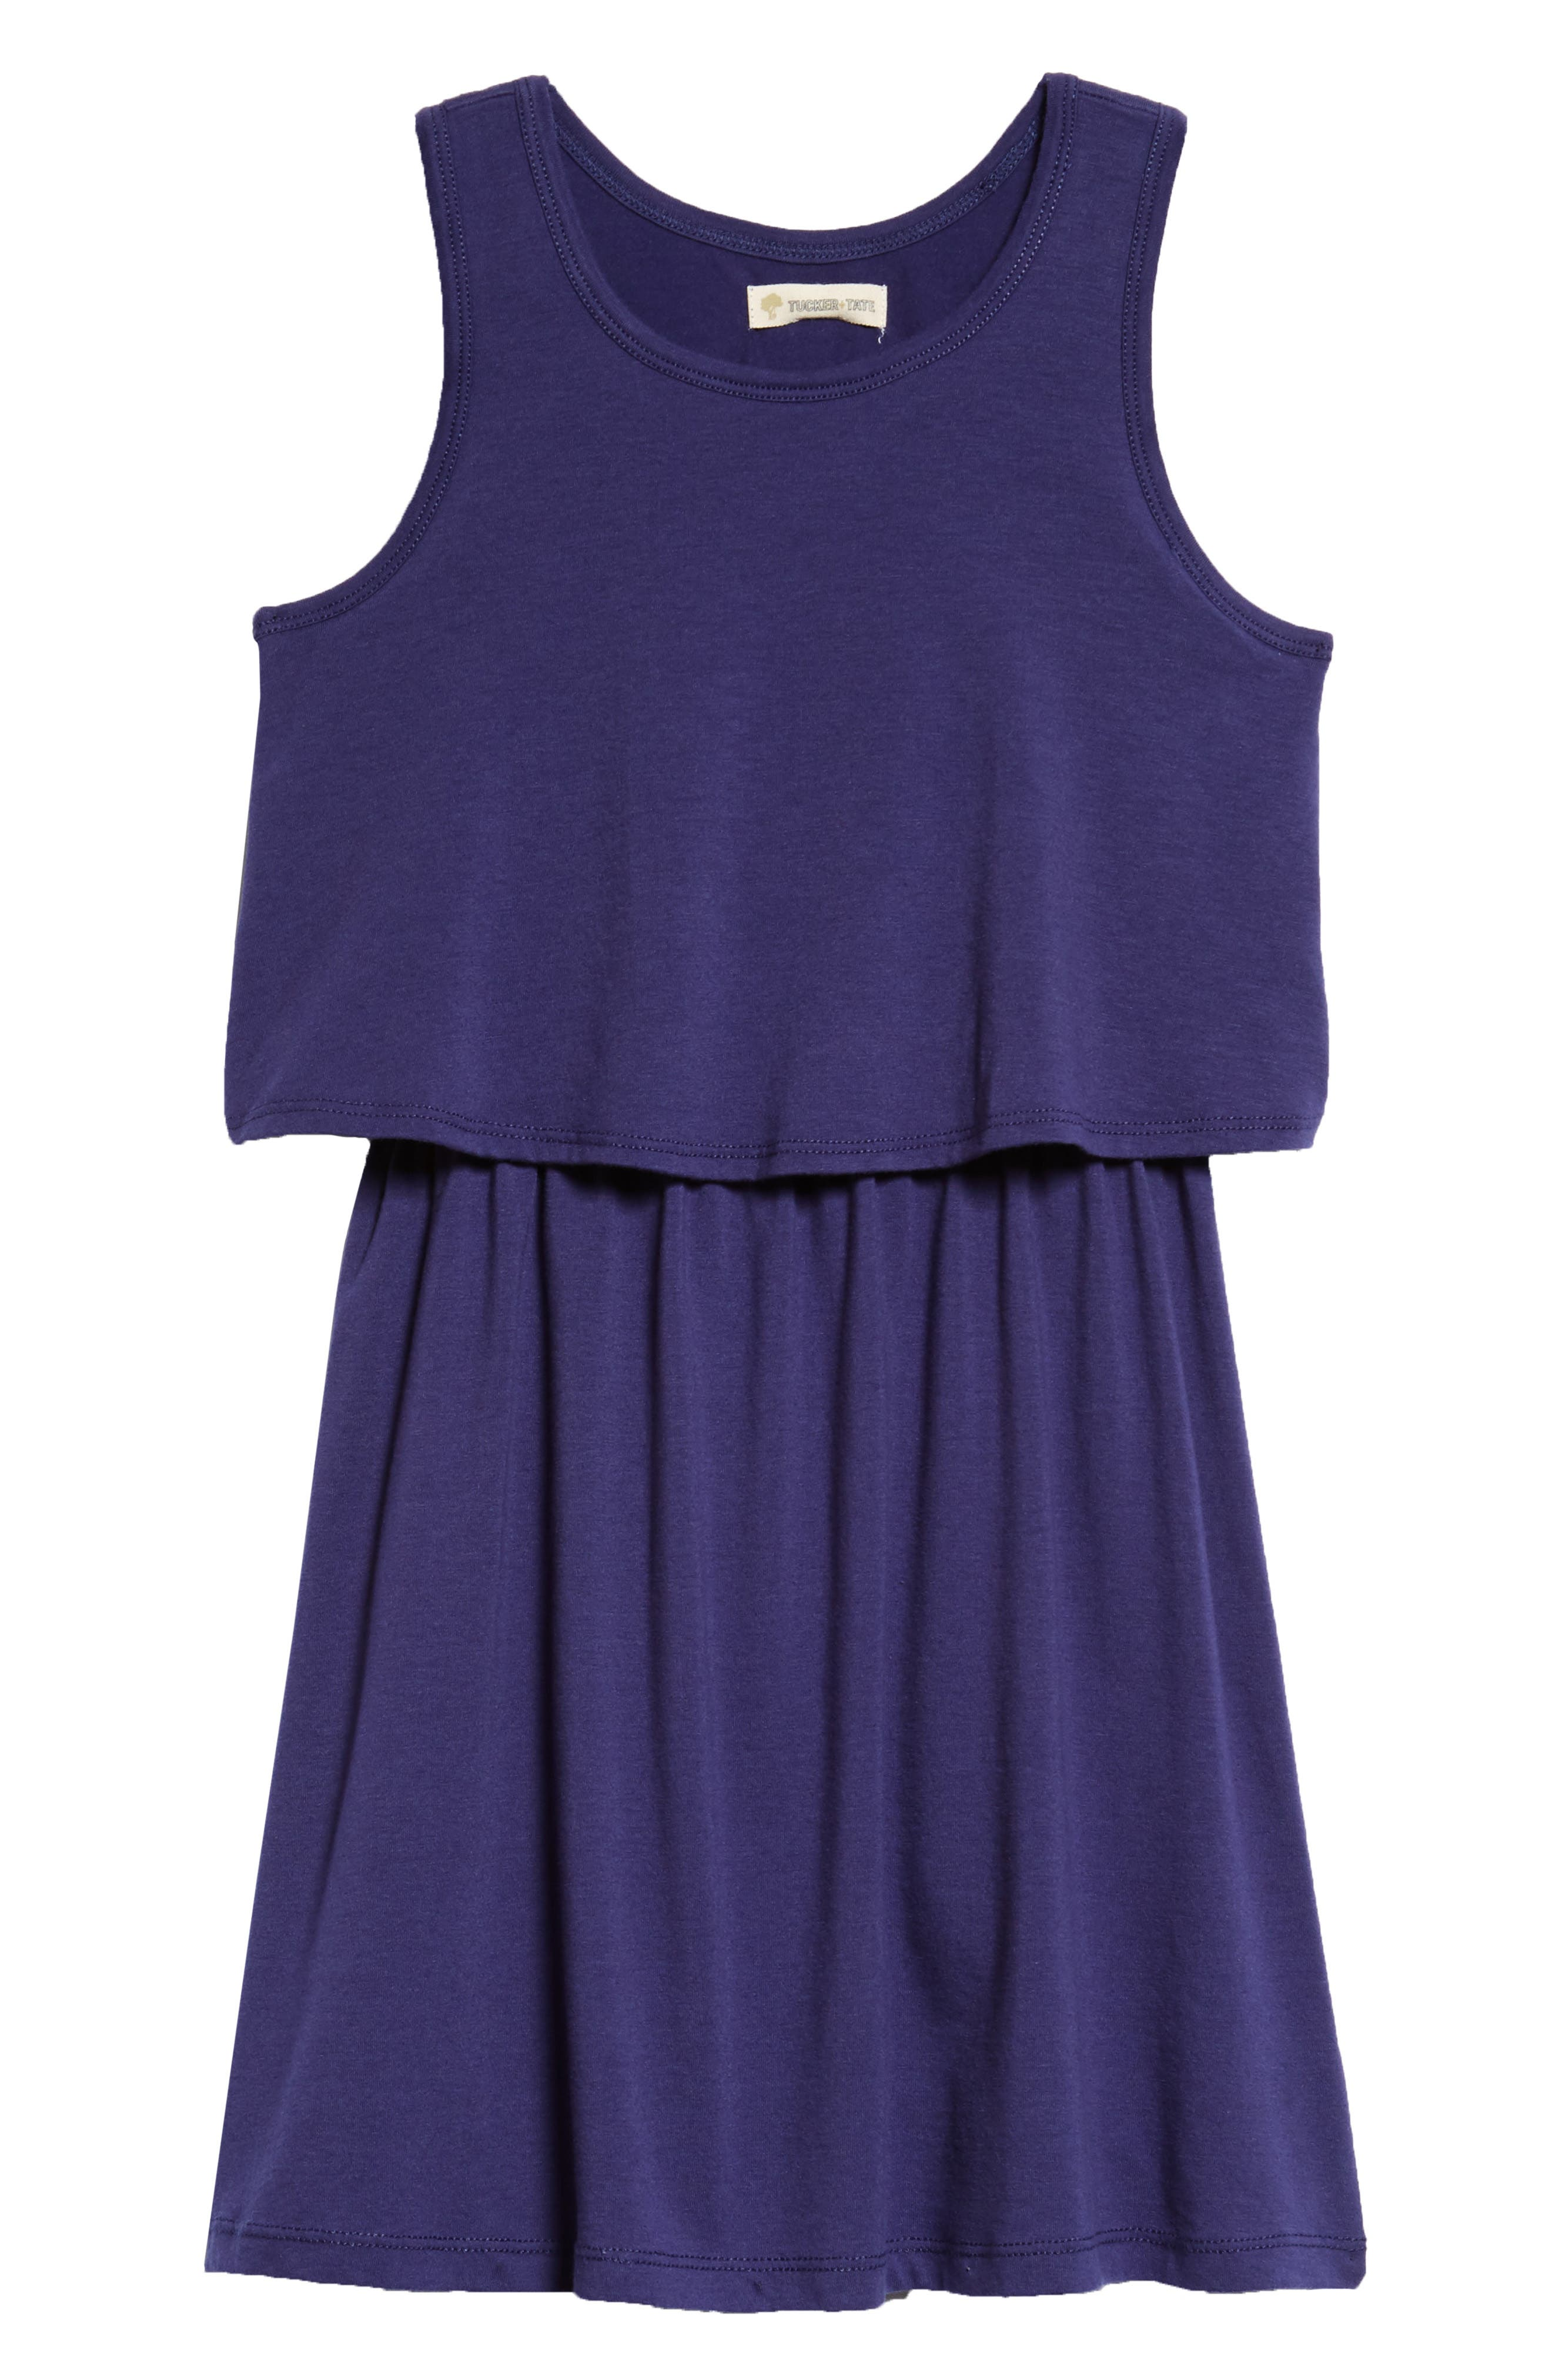 Popover Knit Tank Dress,                         Main,                         color, 410